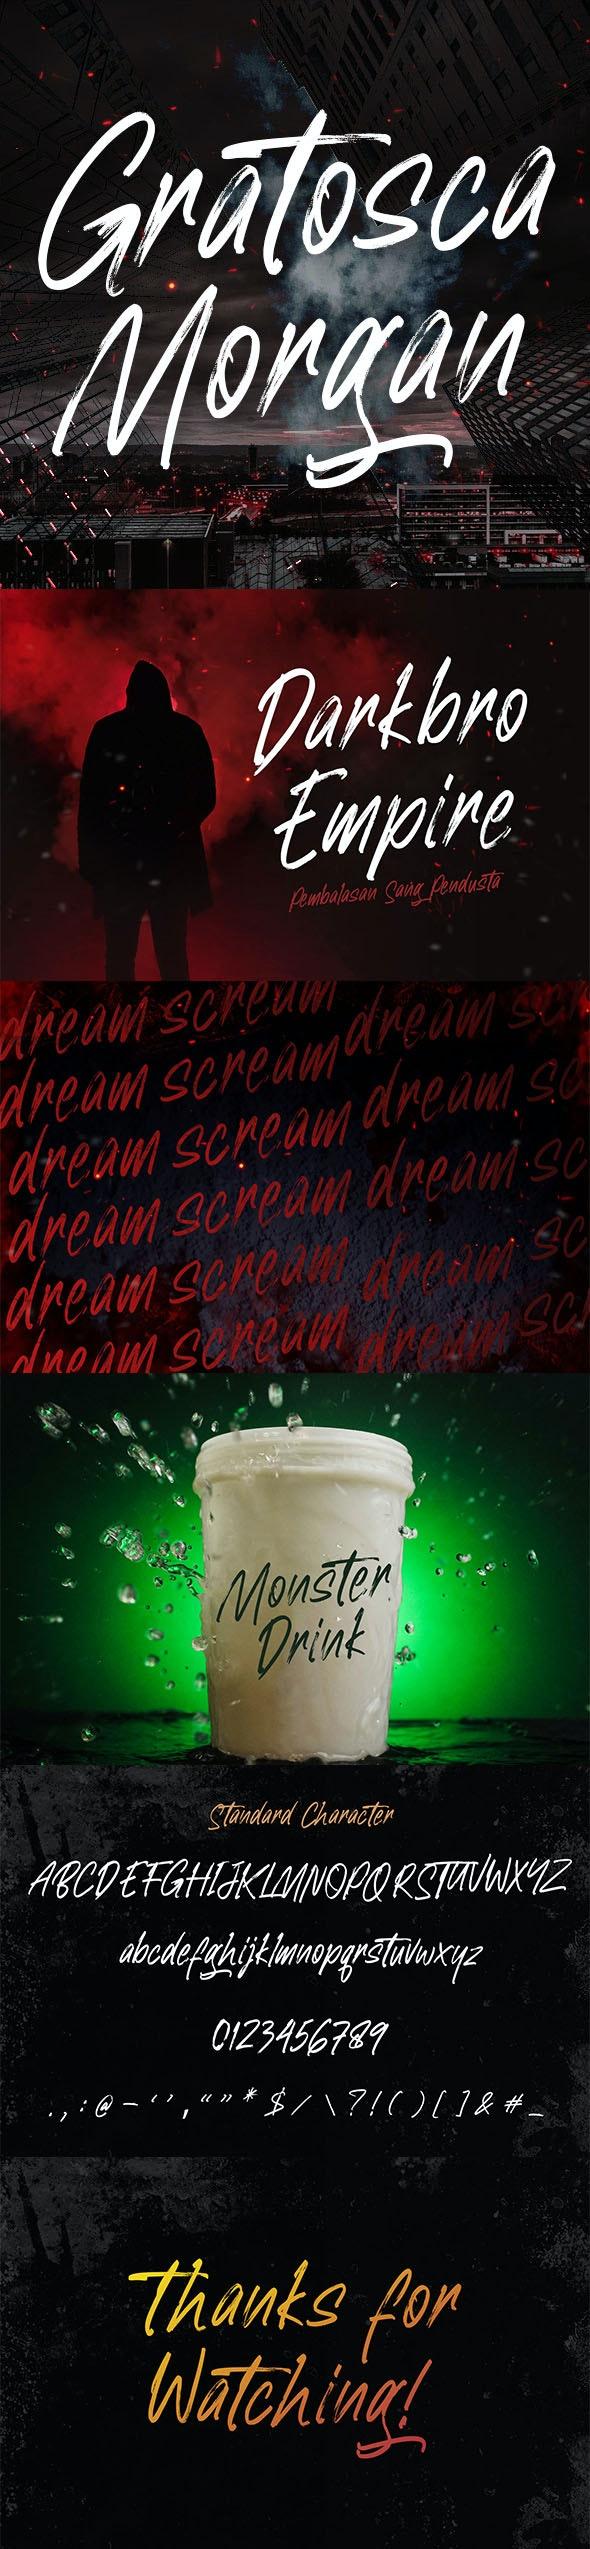 Gratosca Morgan Brush Font - Graffiti Fonts